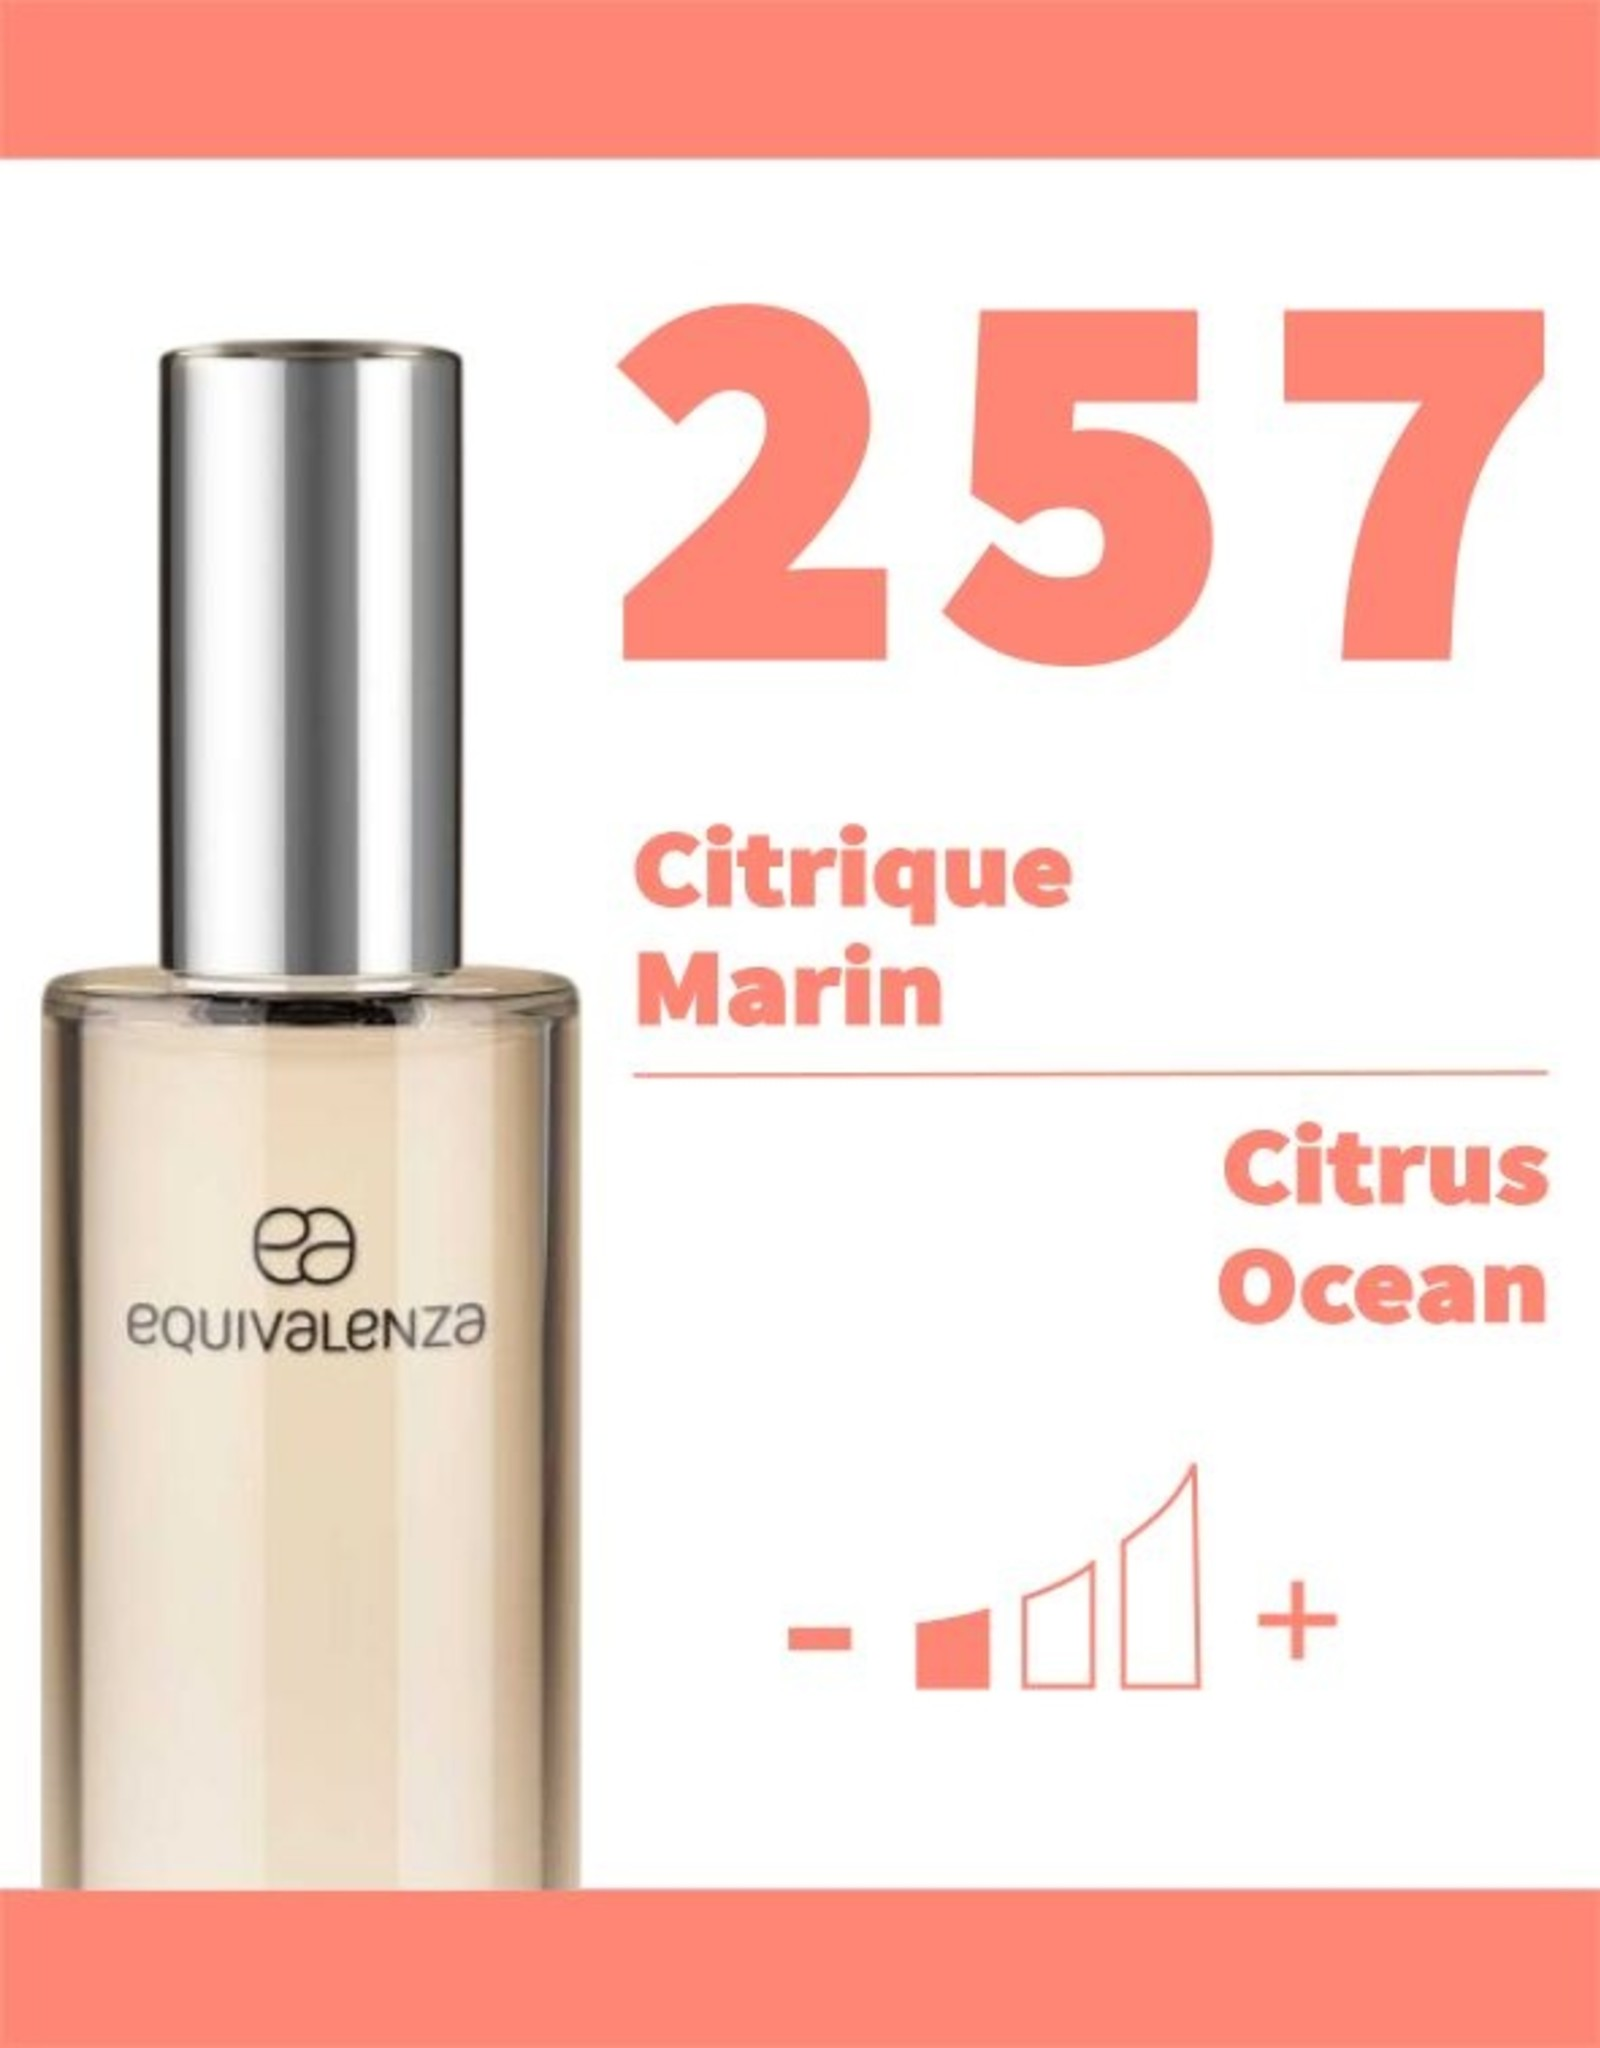 Equivalenza Citrique Marin 257